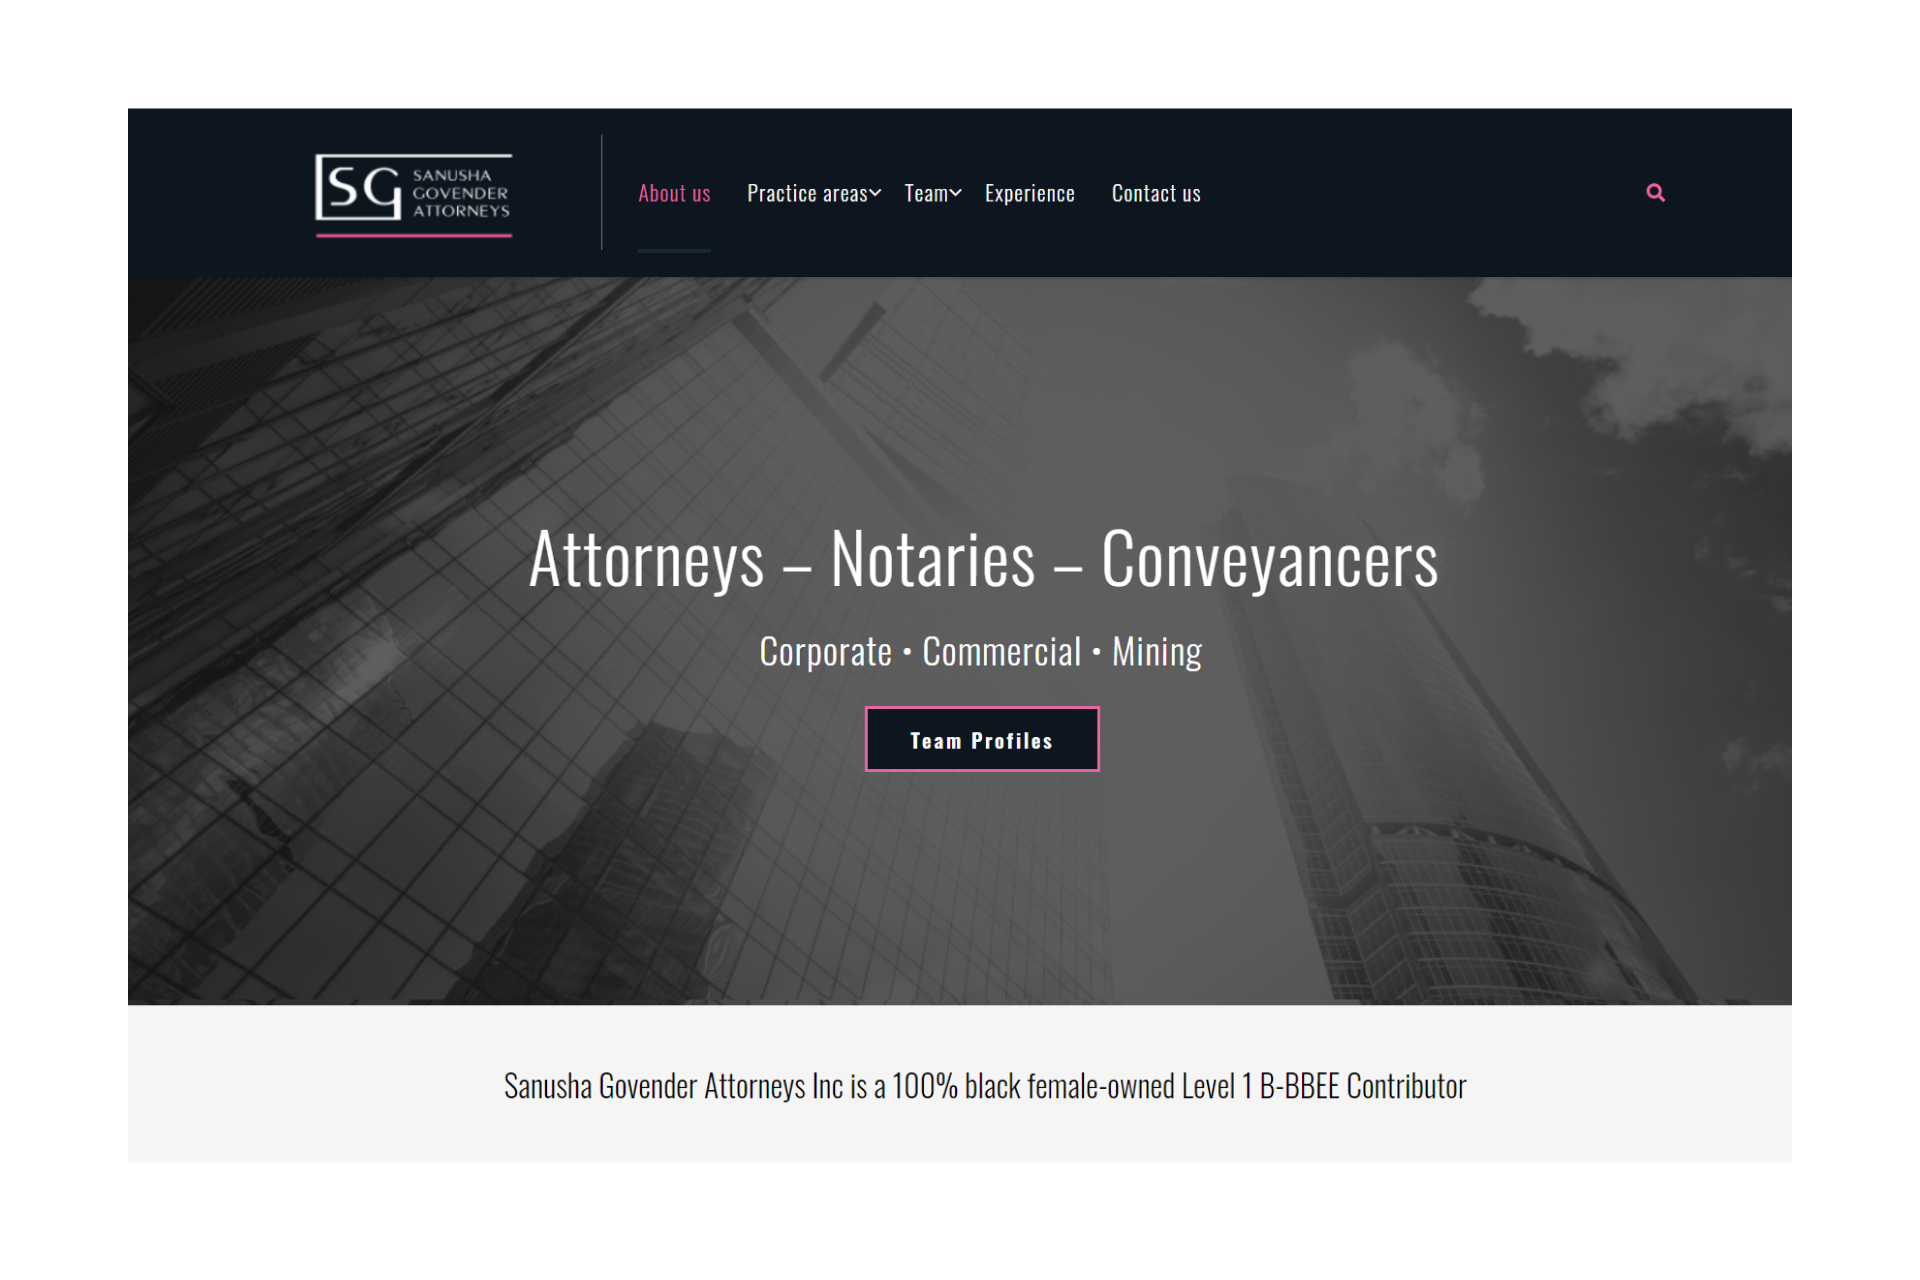 Sanusha Govender Attorneys Inc